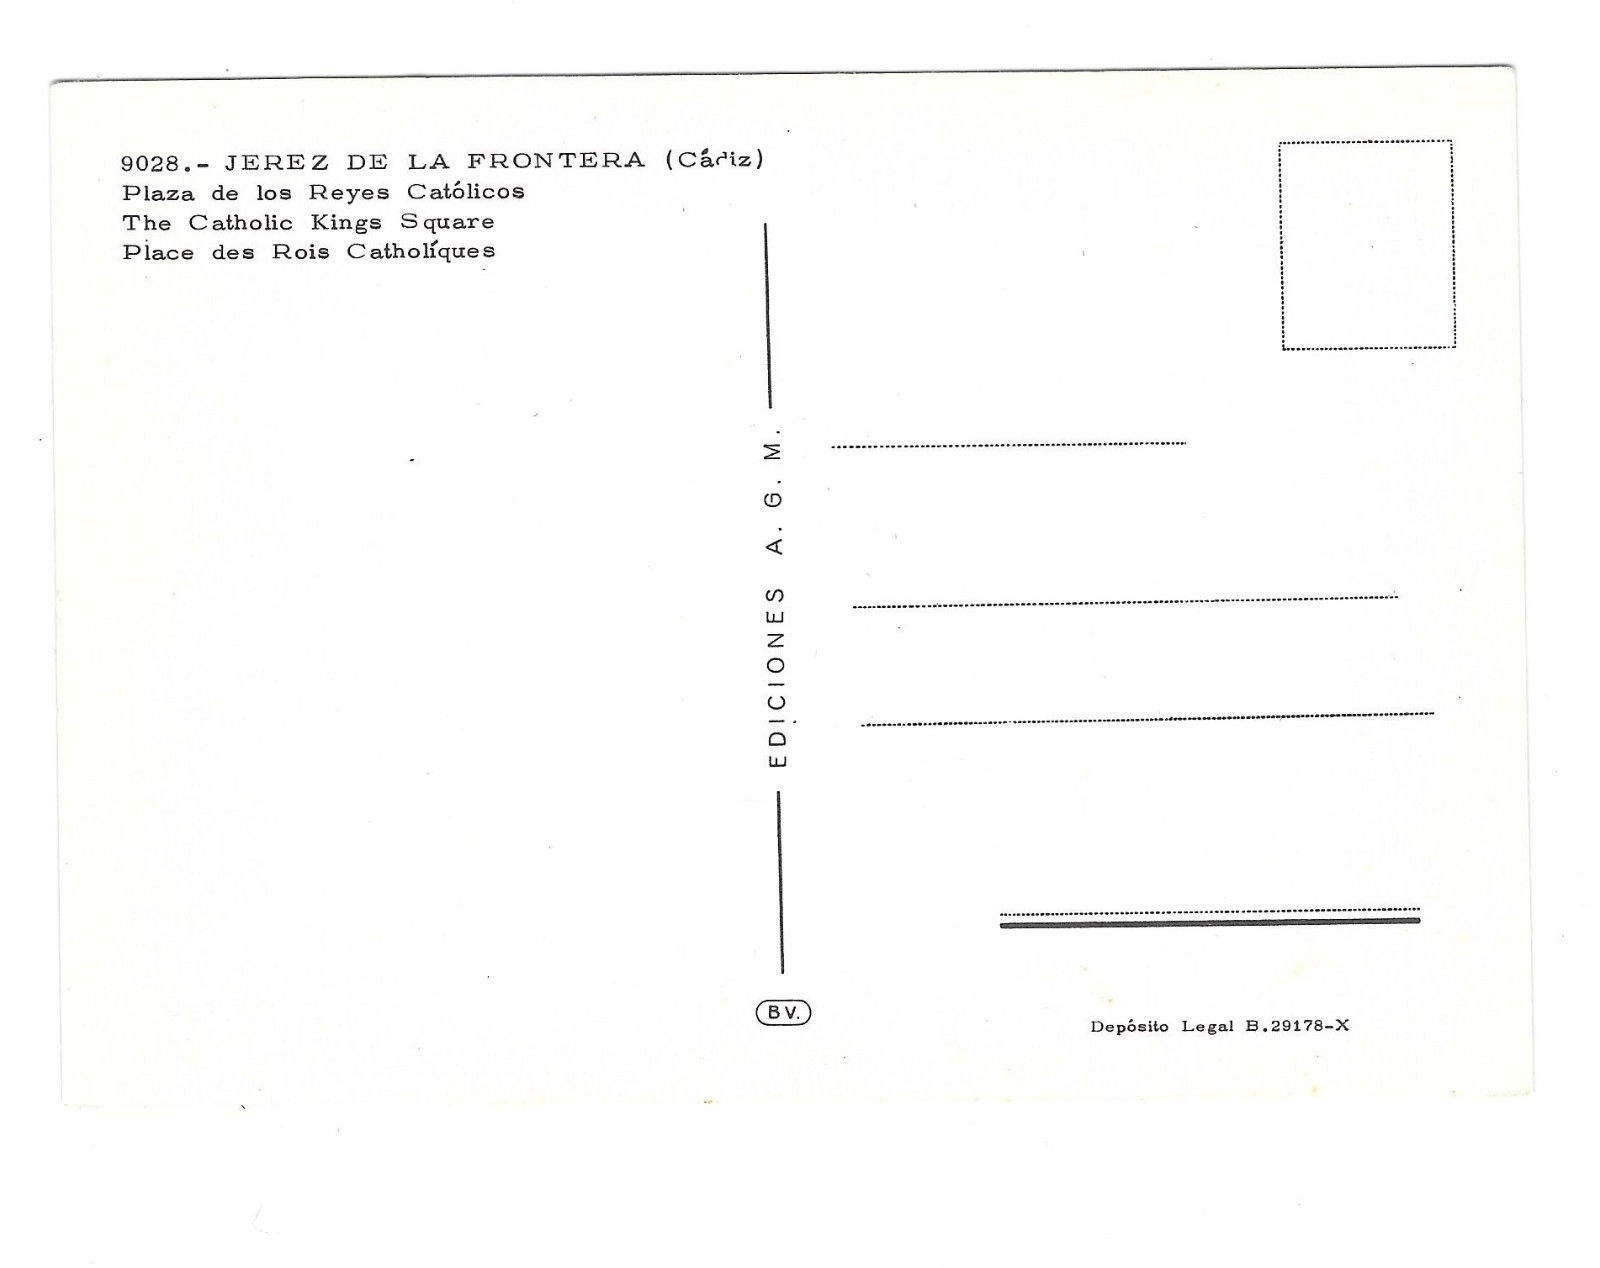 Spain Cadiz Jerez de la Frontera Catholic Kings Square Vtg Postcard 4X6